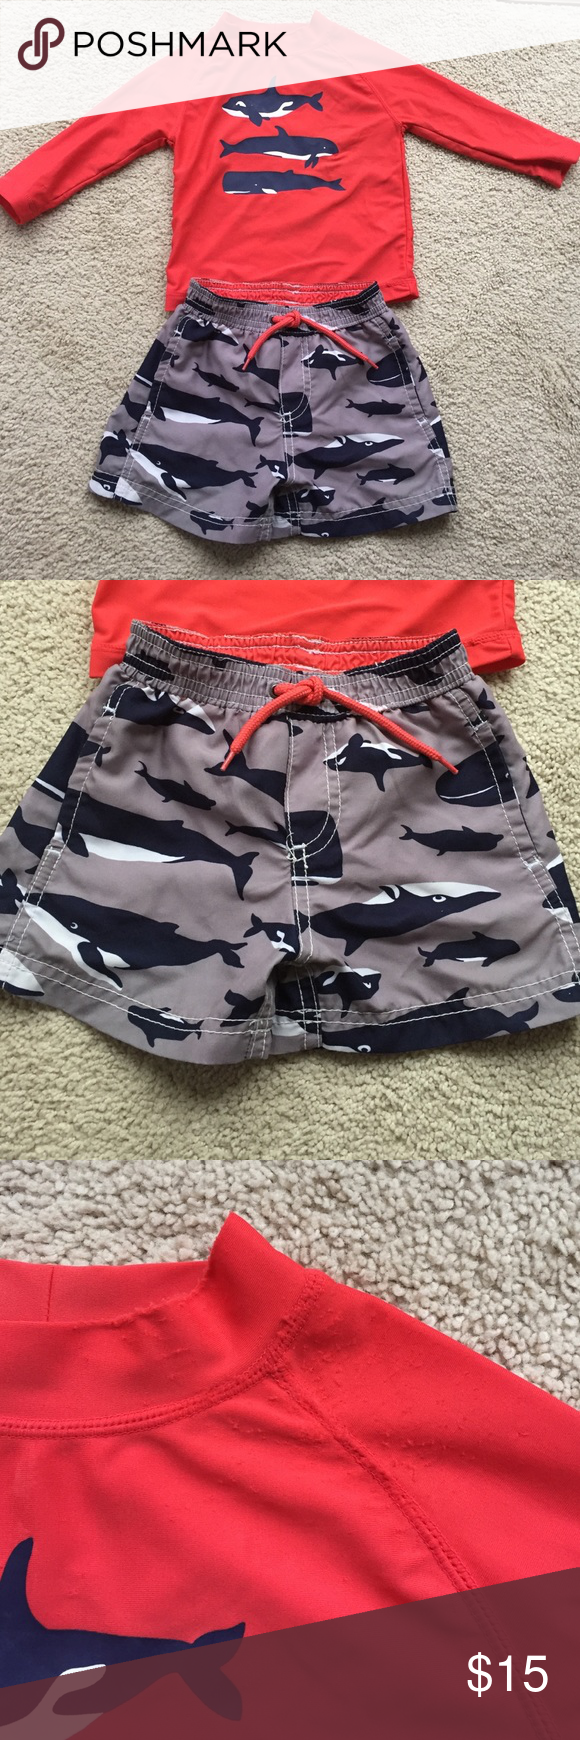 37140d8e22 Carter's Whale print swim trunks & rash guard Adorable two piece set  includes swim trunks